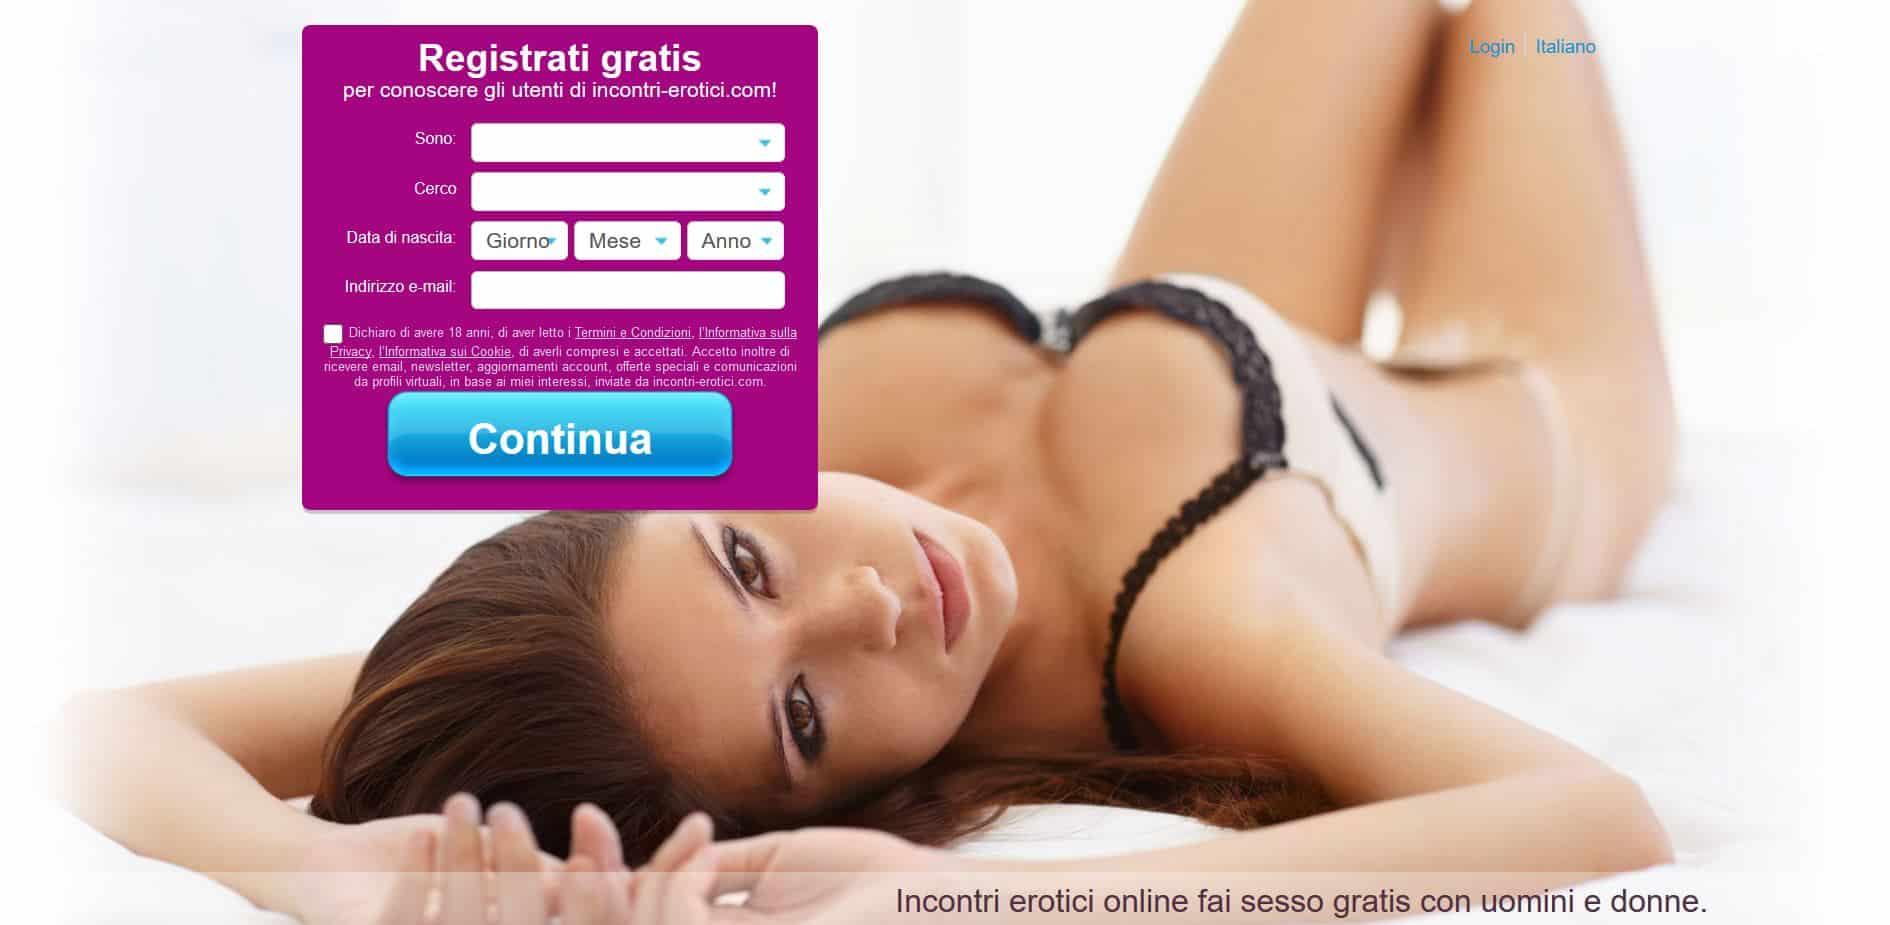 www.incontri-erotici.com